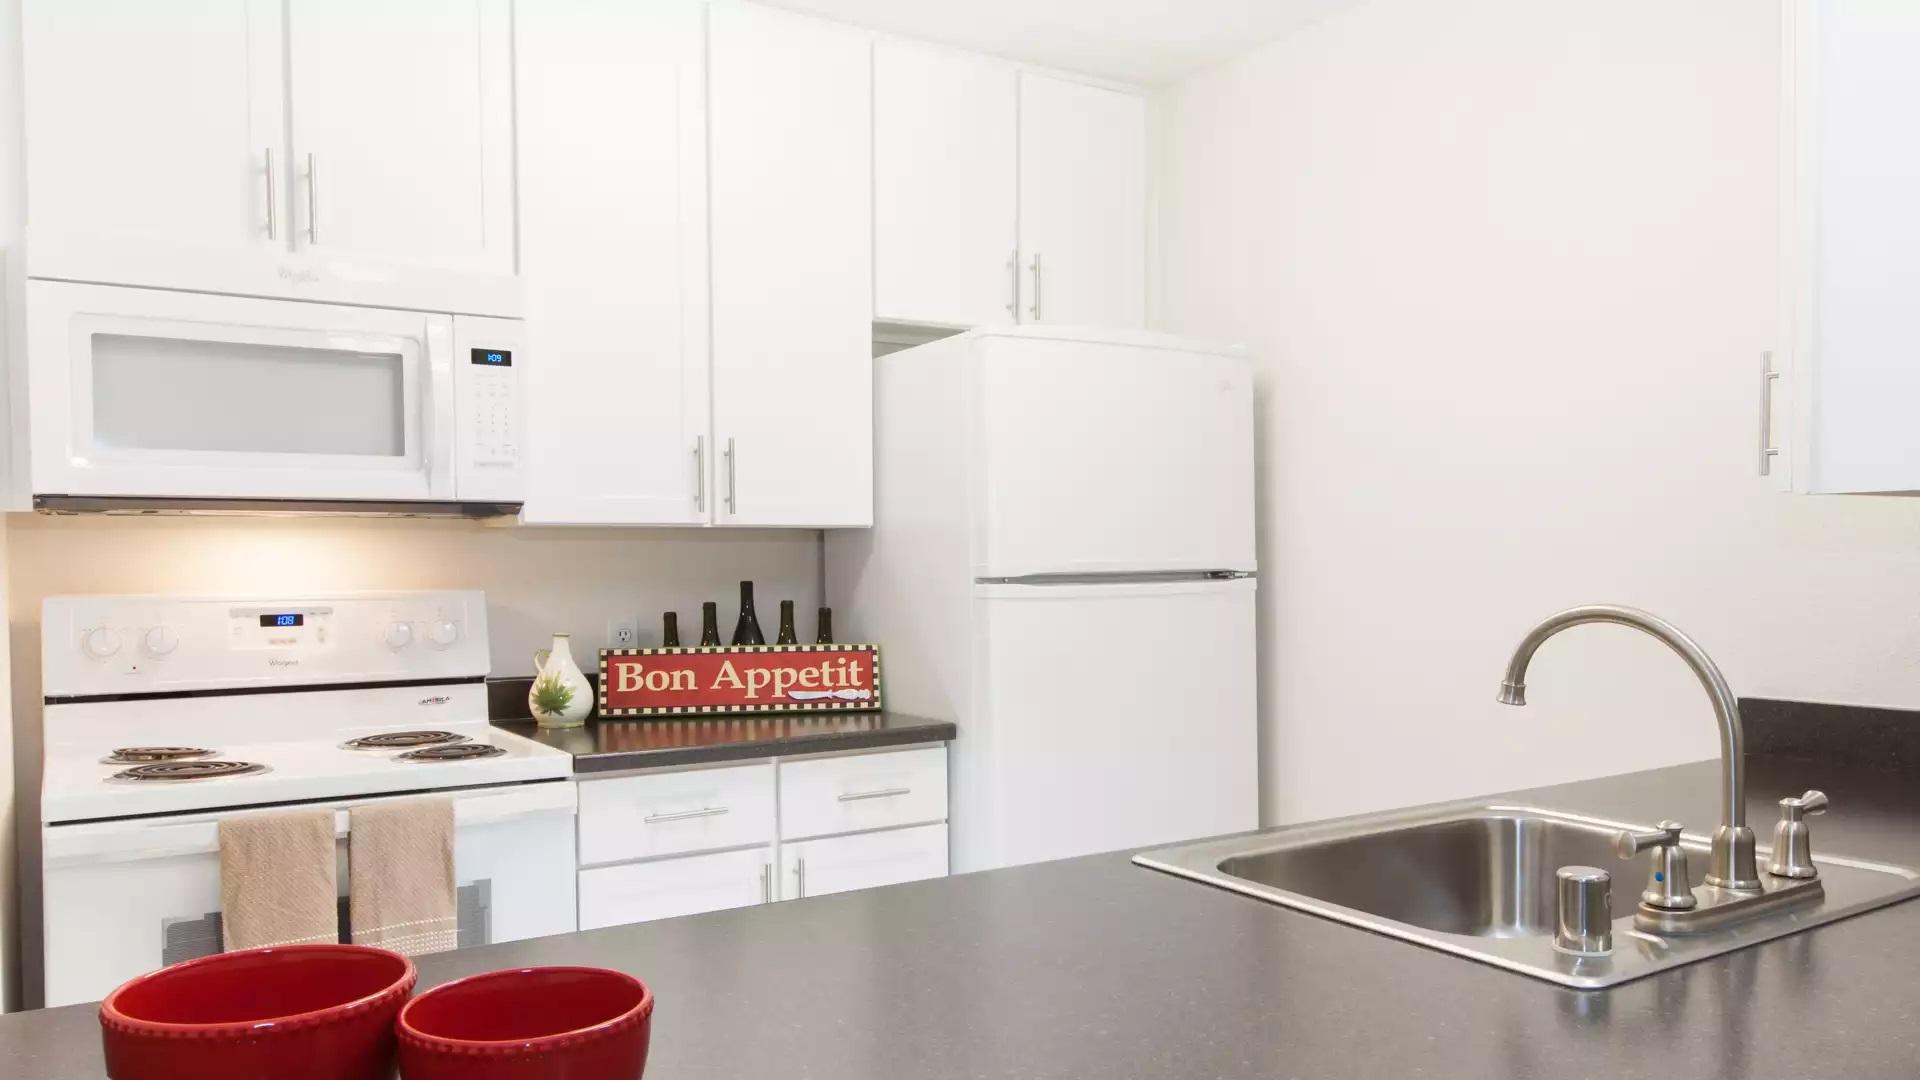 Artistry Emeryville Apartments - Emeryville, CA